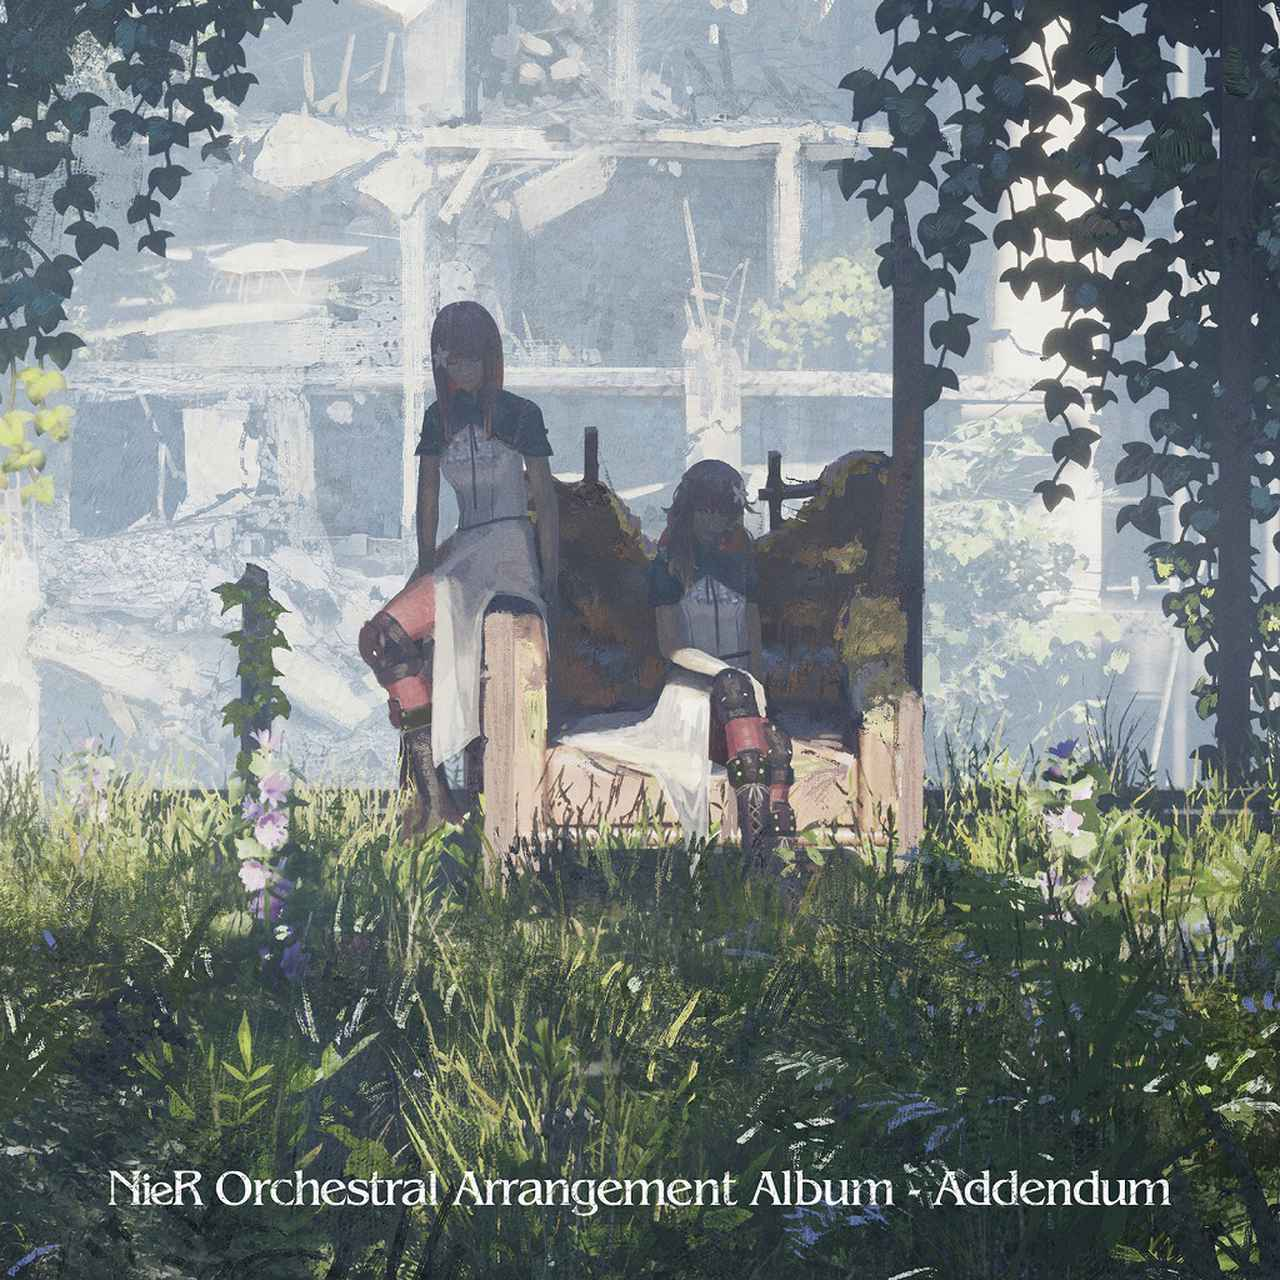 画像: NieR Orchestral Arrangement Album - Addendum / 岡部啓一